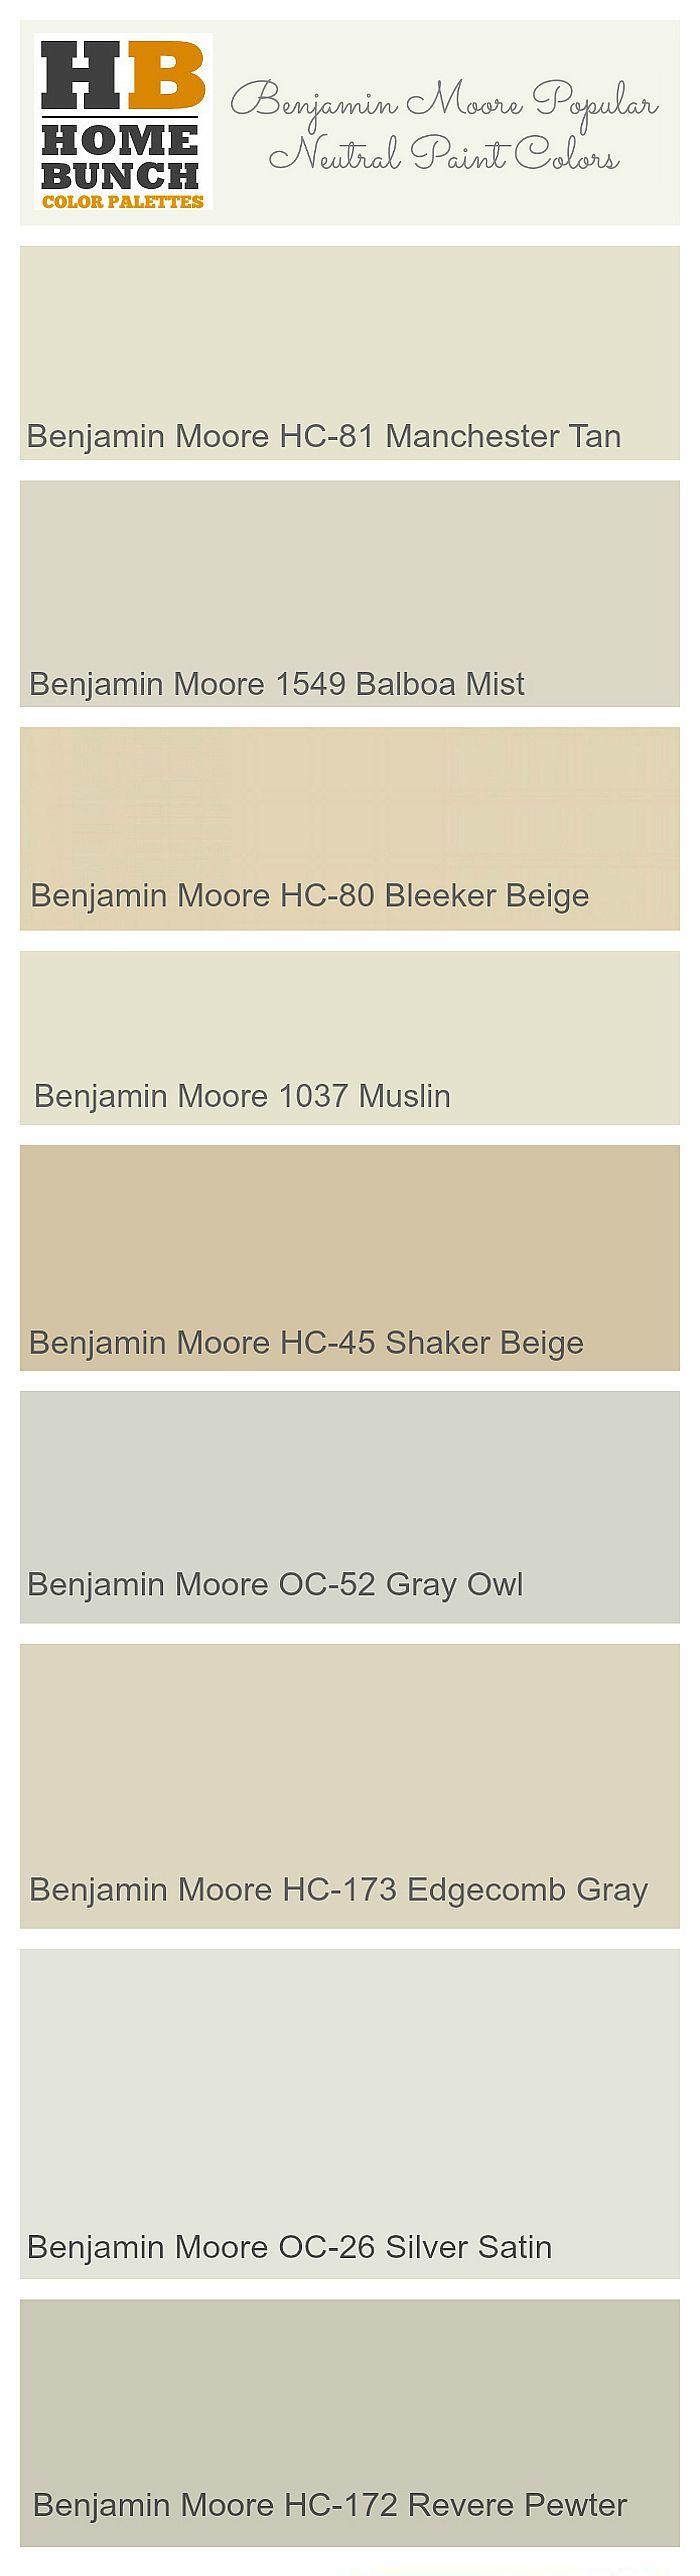 Benjamin Moore Popular Neutral Paint Colors Manchester Tan Balboa Mist Bleeker Beige Muslin